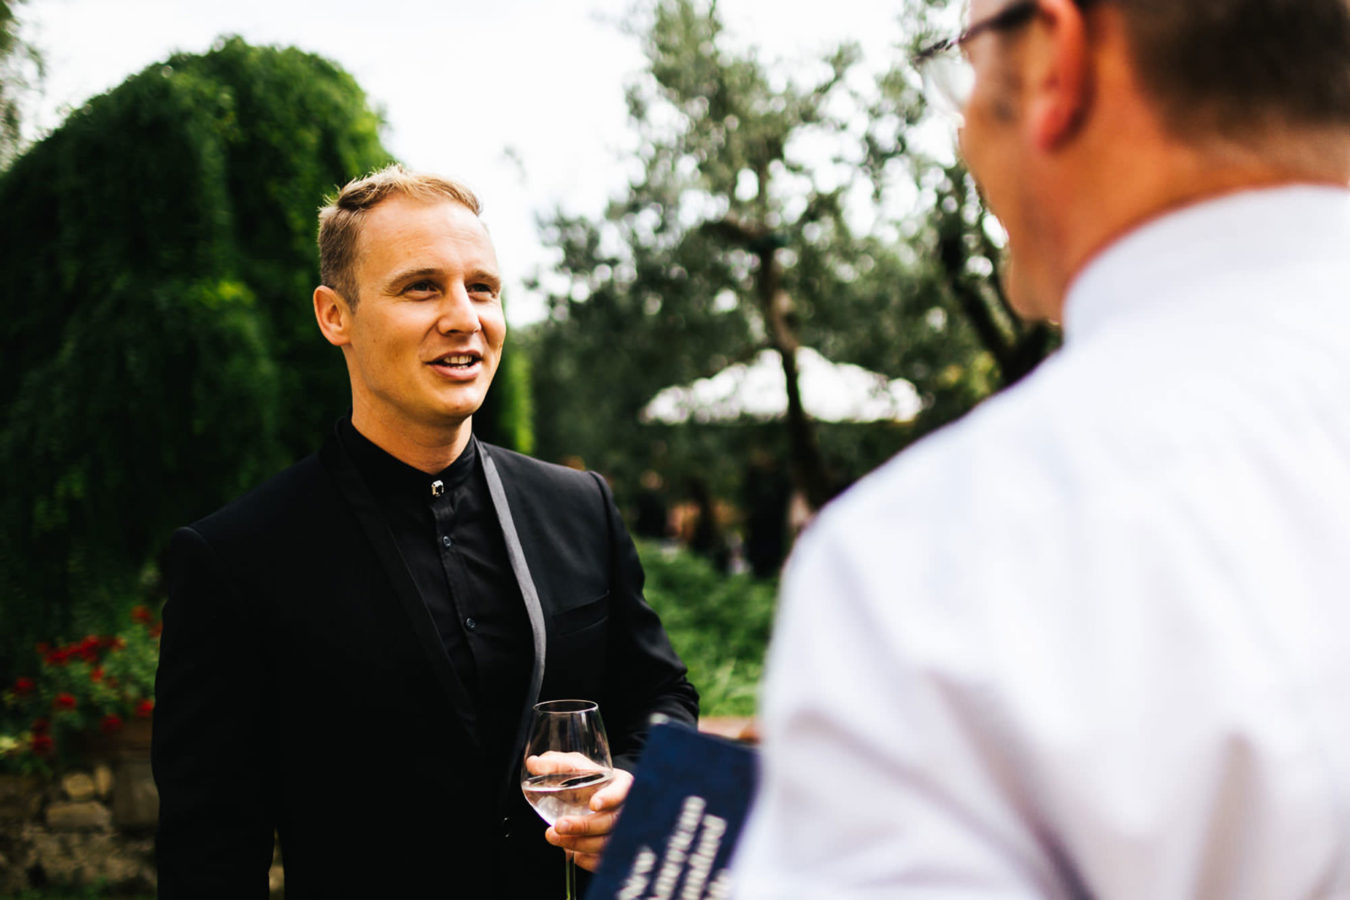 fotografo-matrimonio-firenze-toscana-5